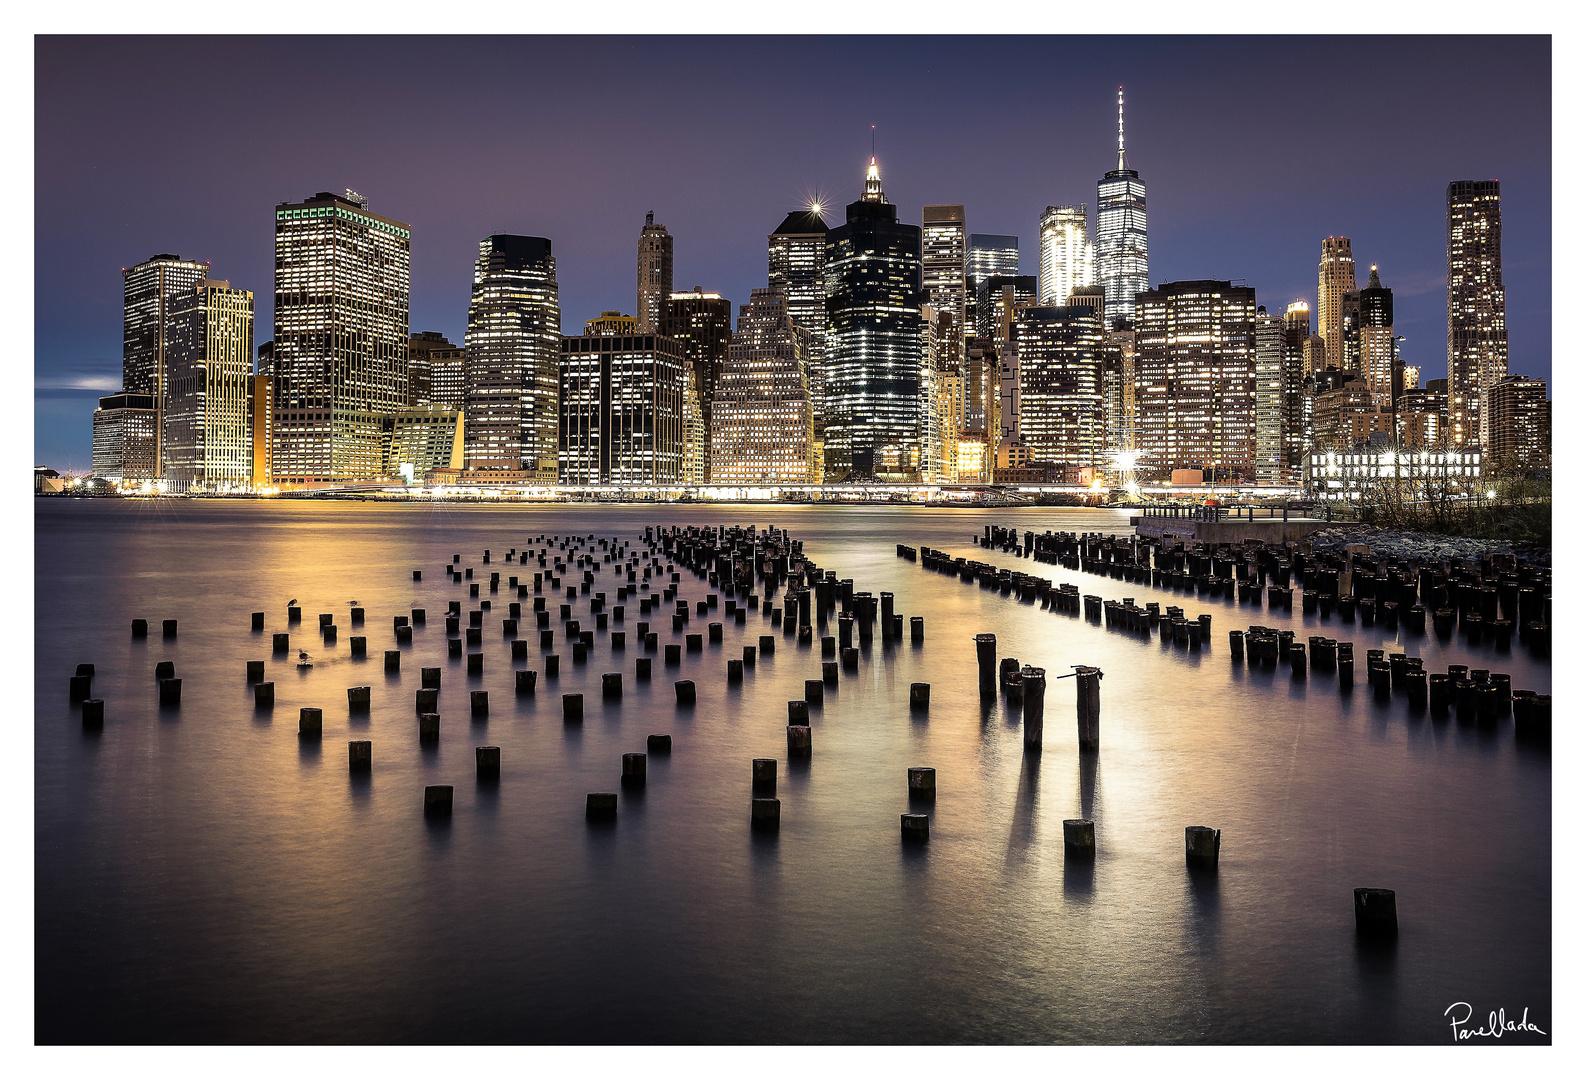 Giant step - New York (2017)